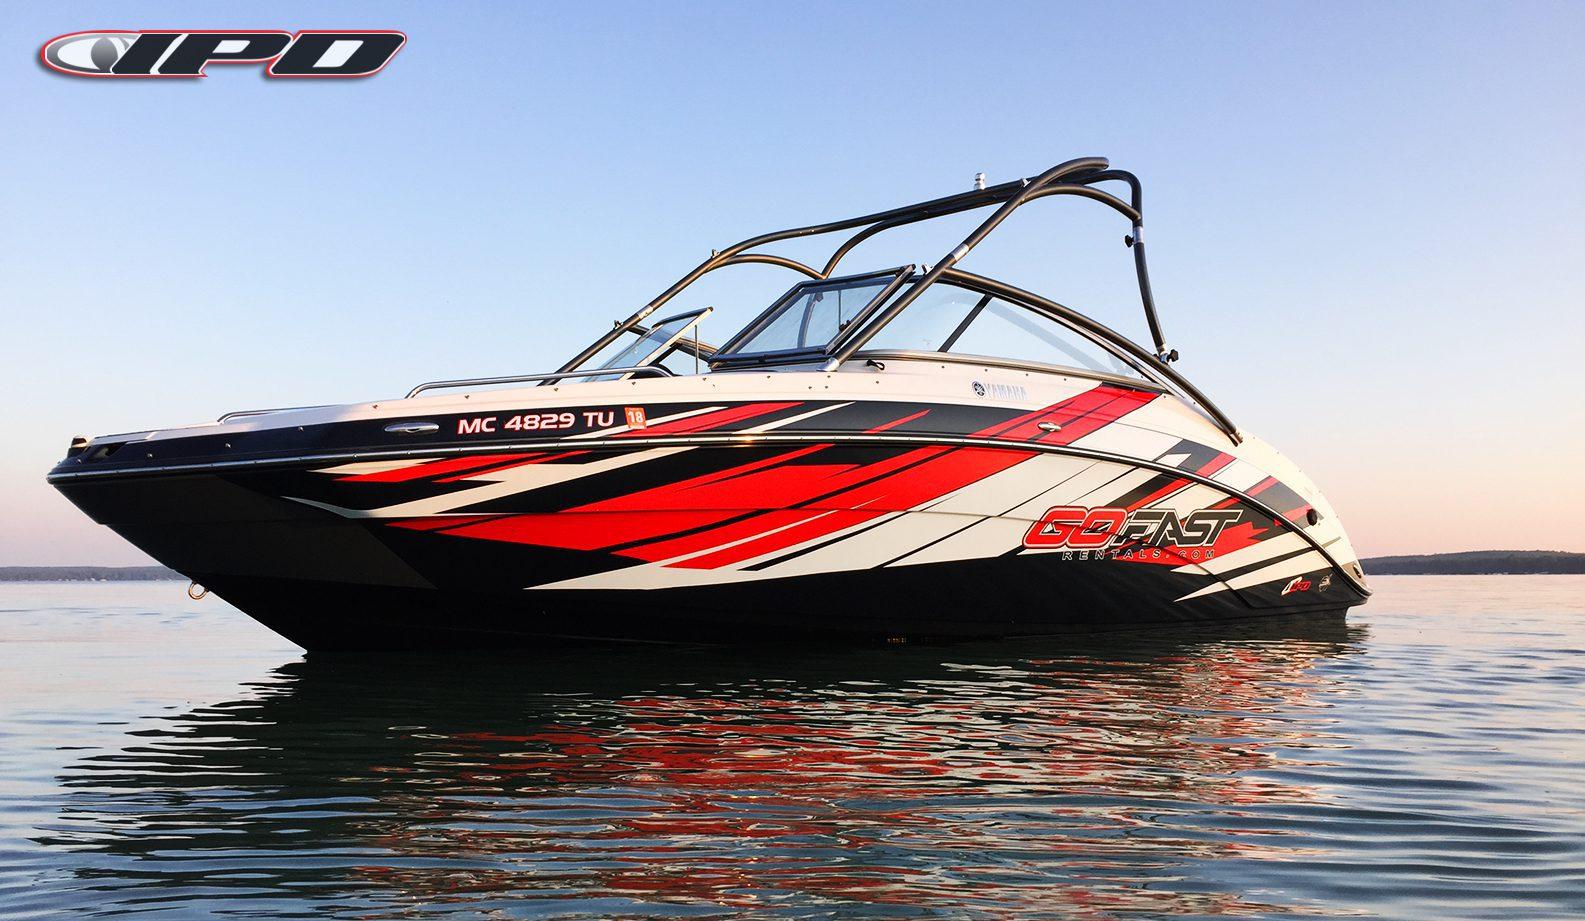 3a819162f9 Custom Designed Boat Graphics Kit (50% Deposit) – IPD Jet Ski Graphics